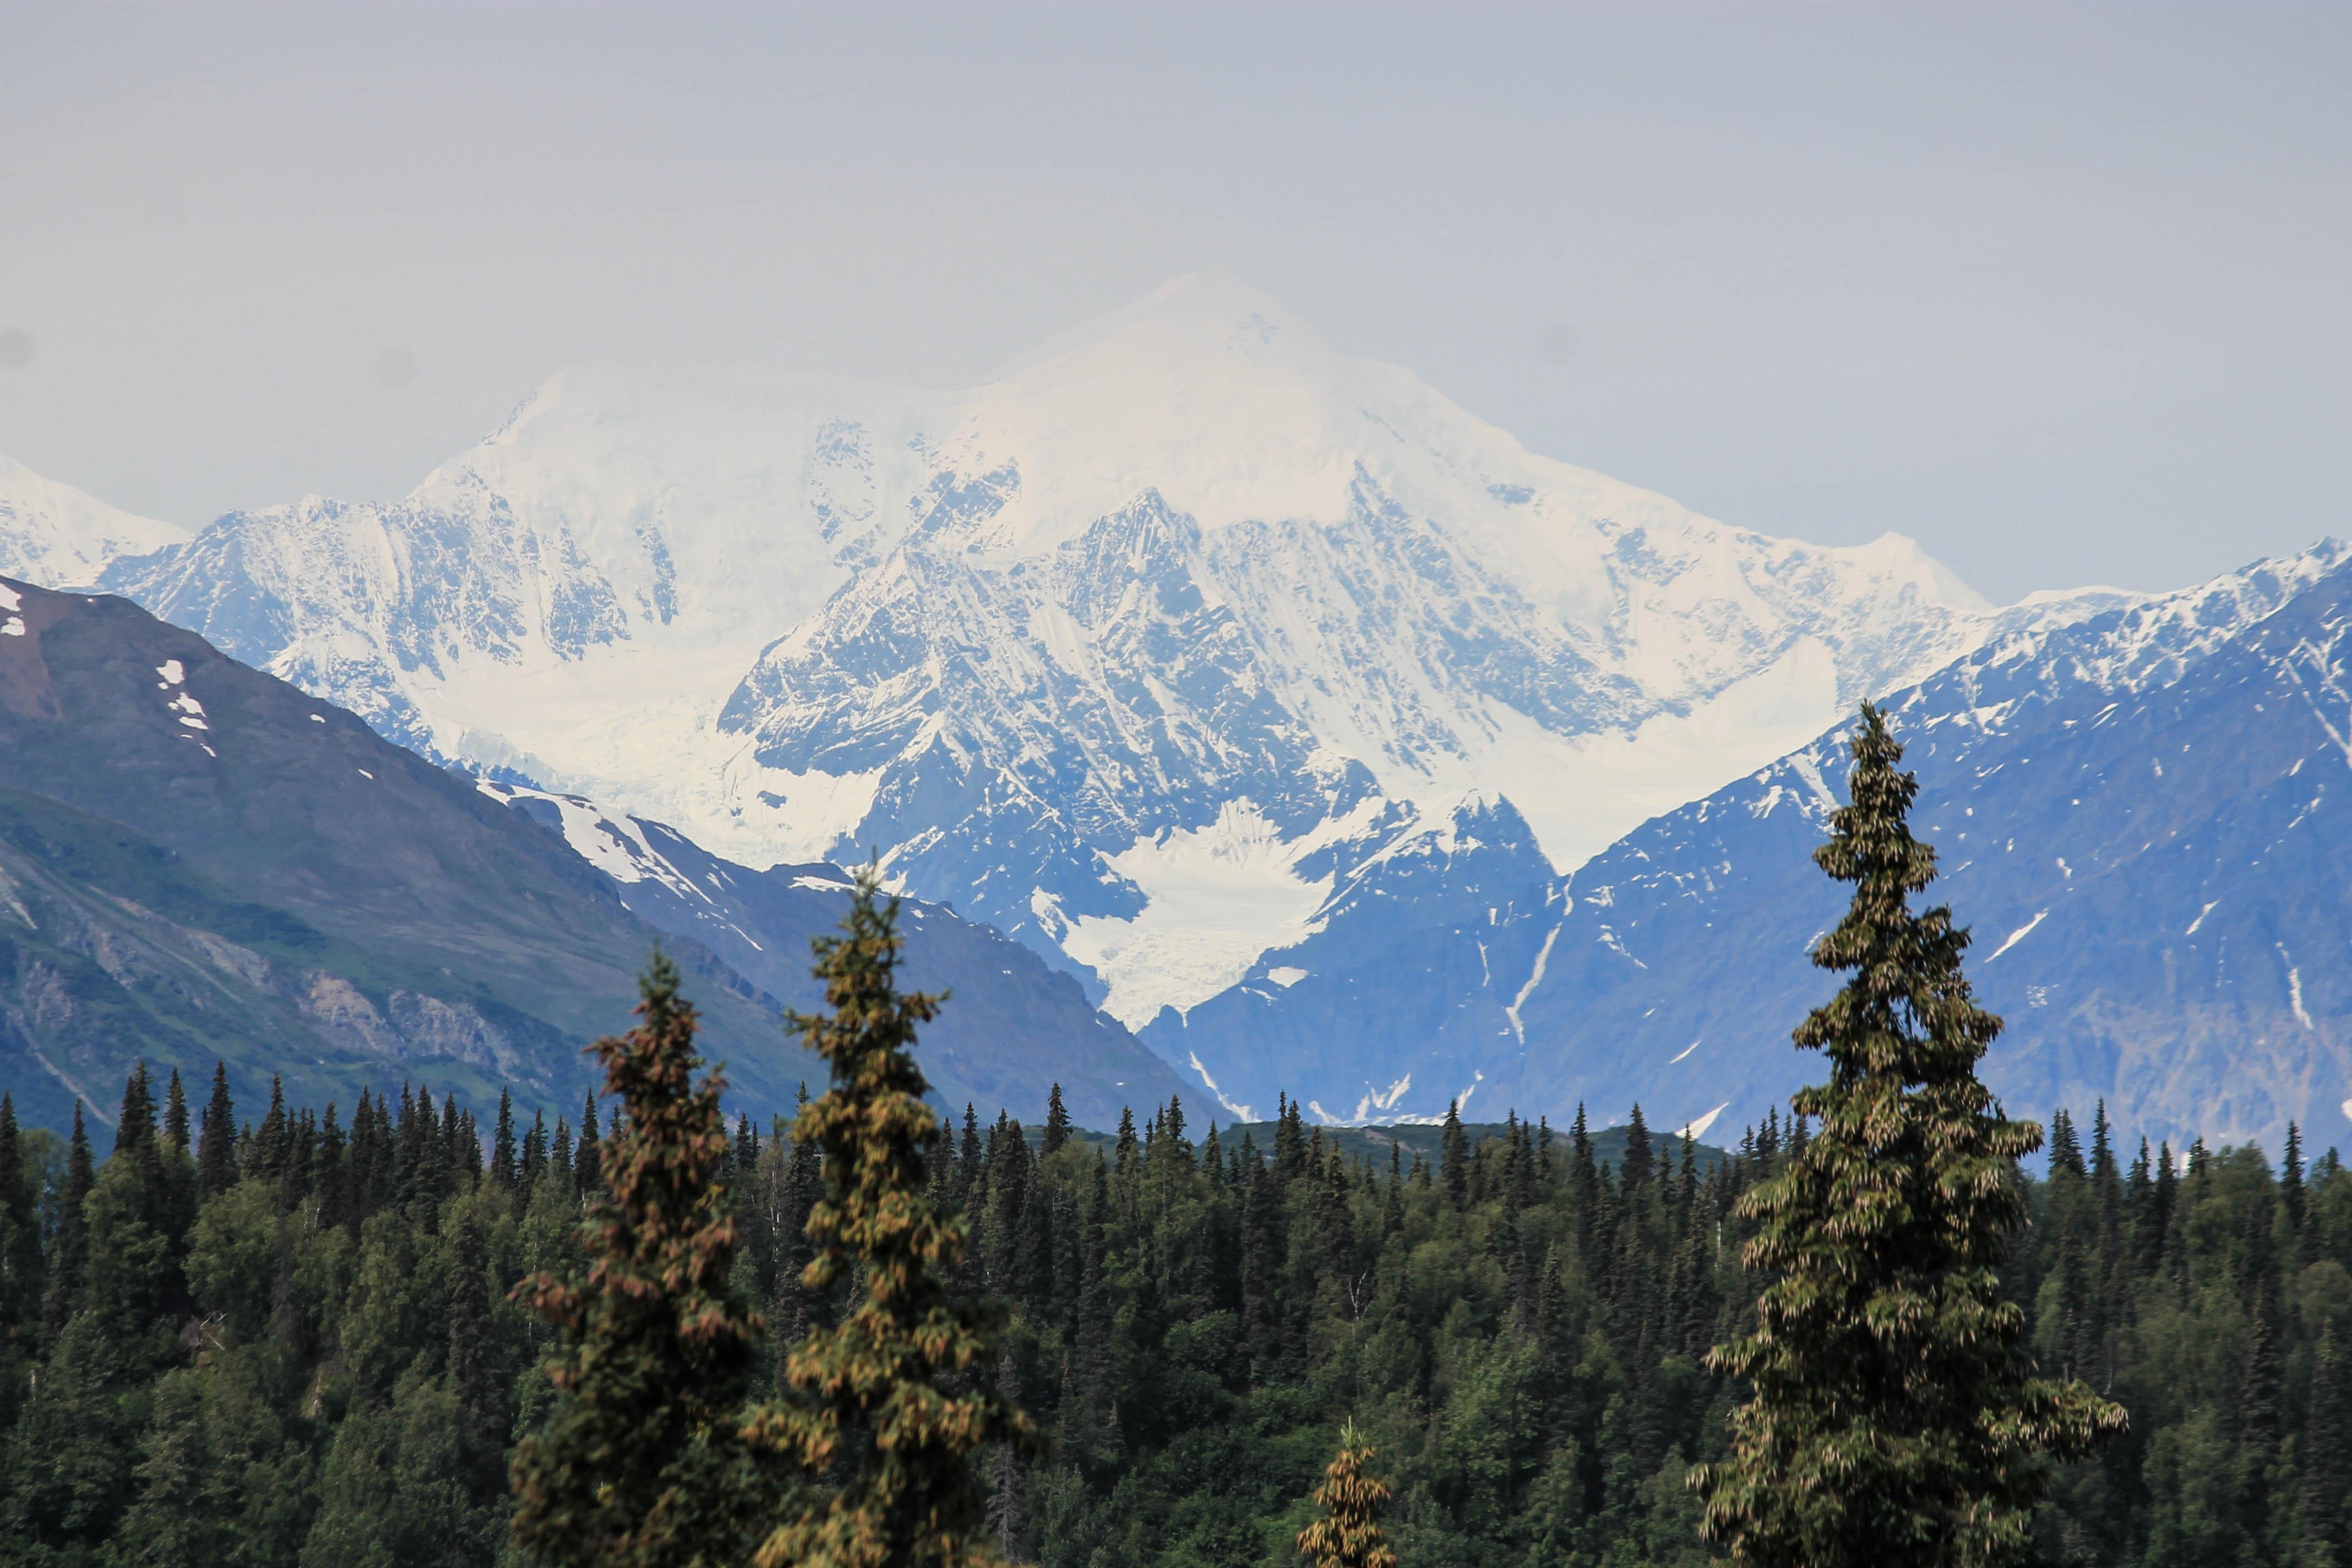 McKinley from Stony Hill Buses Tourism Postcard Denali National Park Alaska Mt